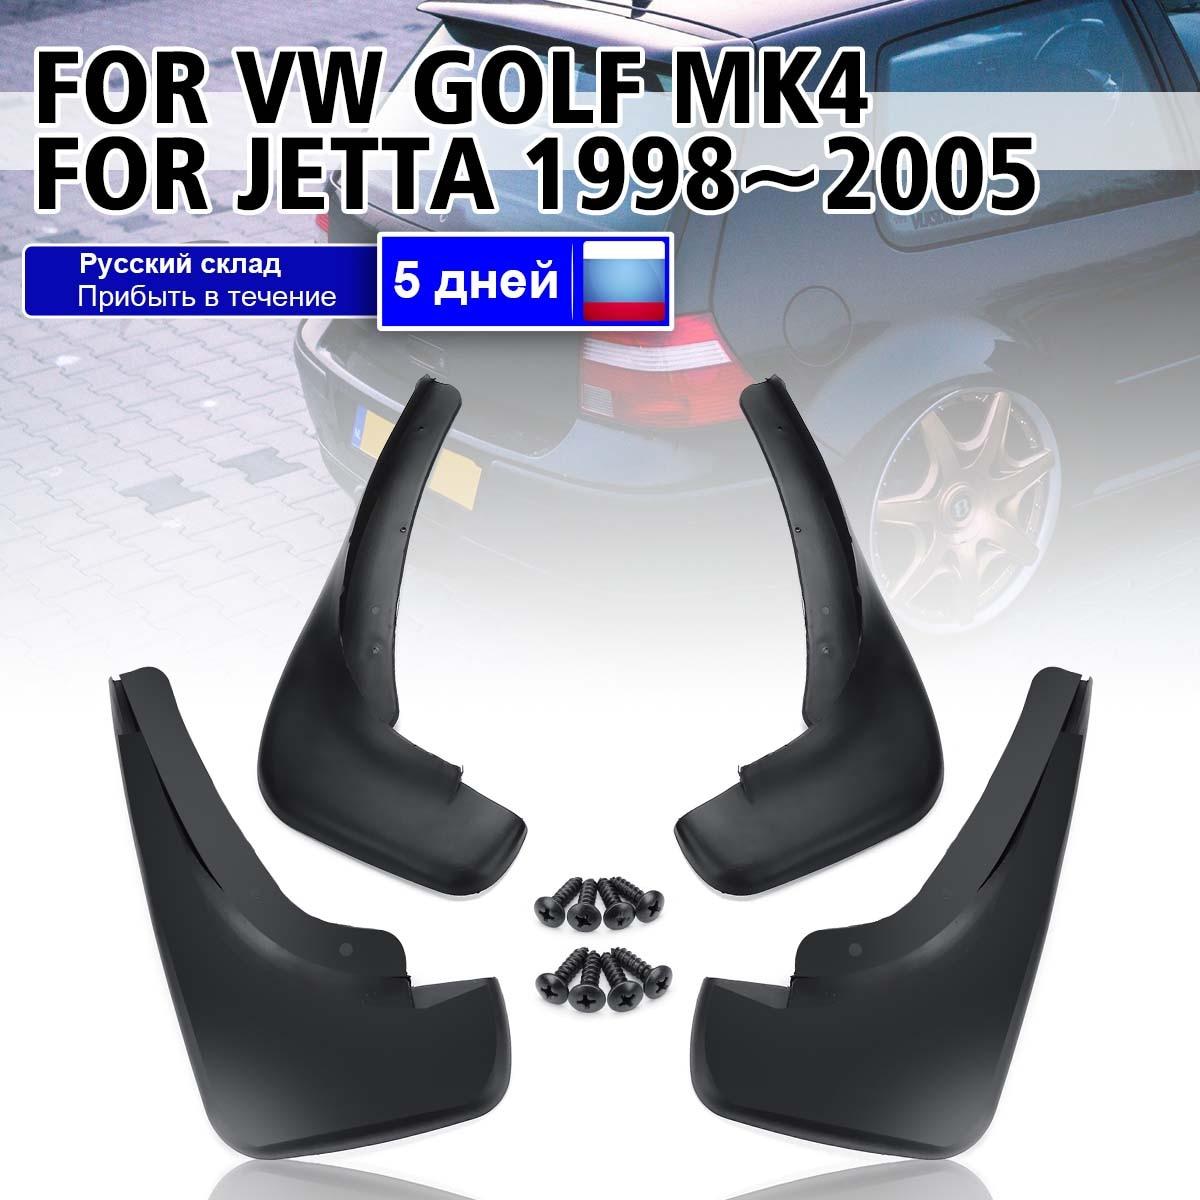 Vw 골프 4 mk4 iv bora jetta 1998-2005 mudflaps 스플래쉬 가드 전면 리어 펜더 머드 가드 용 자동차 머드 플랩